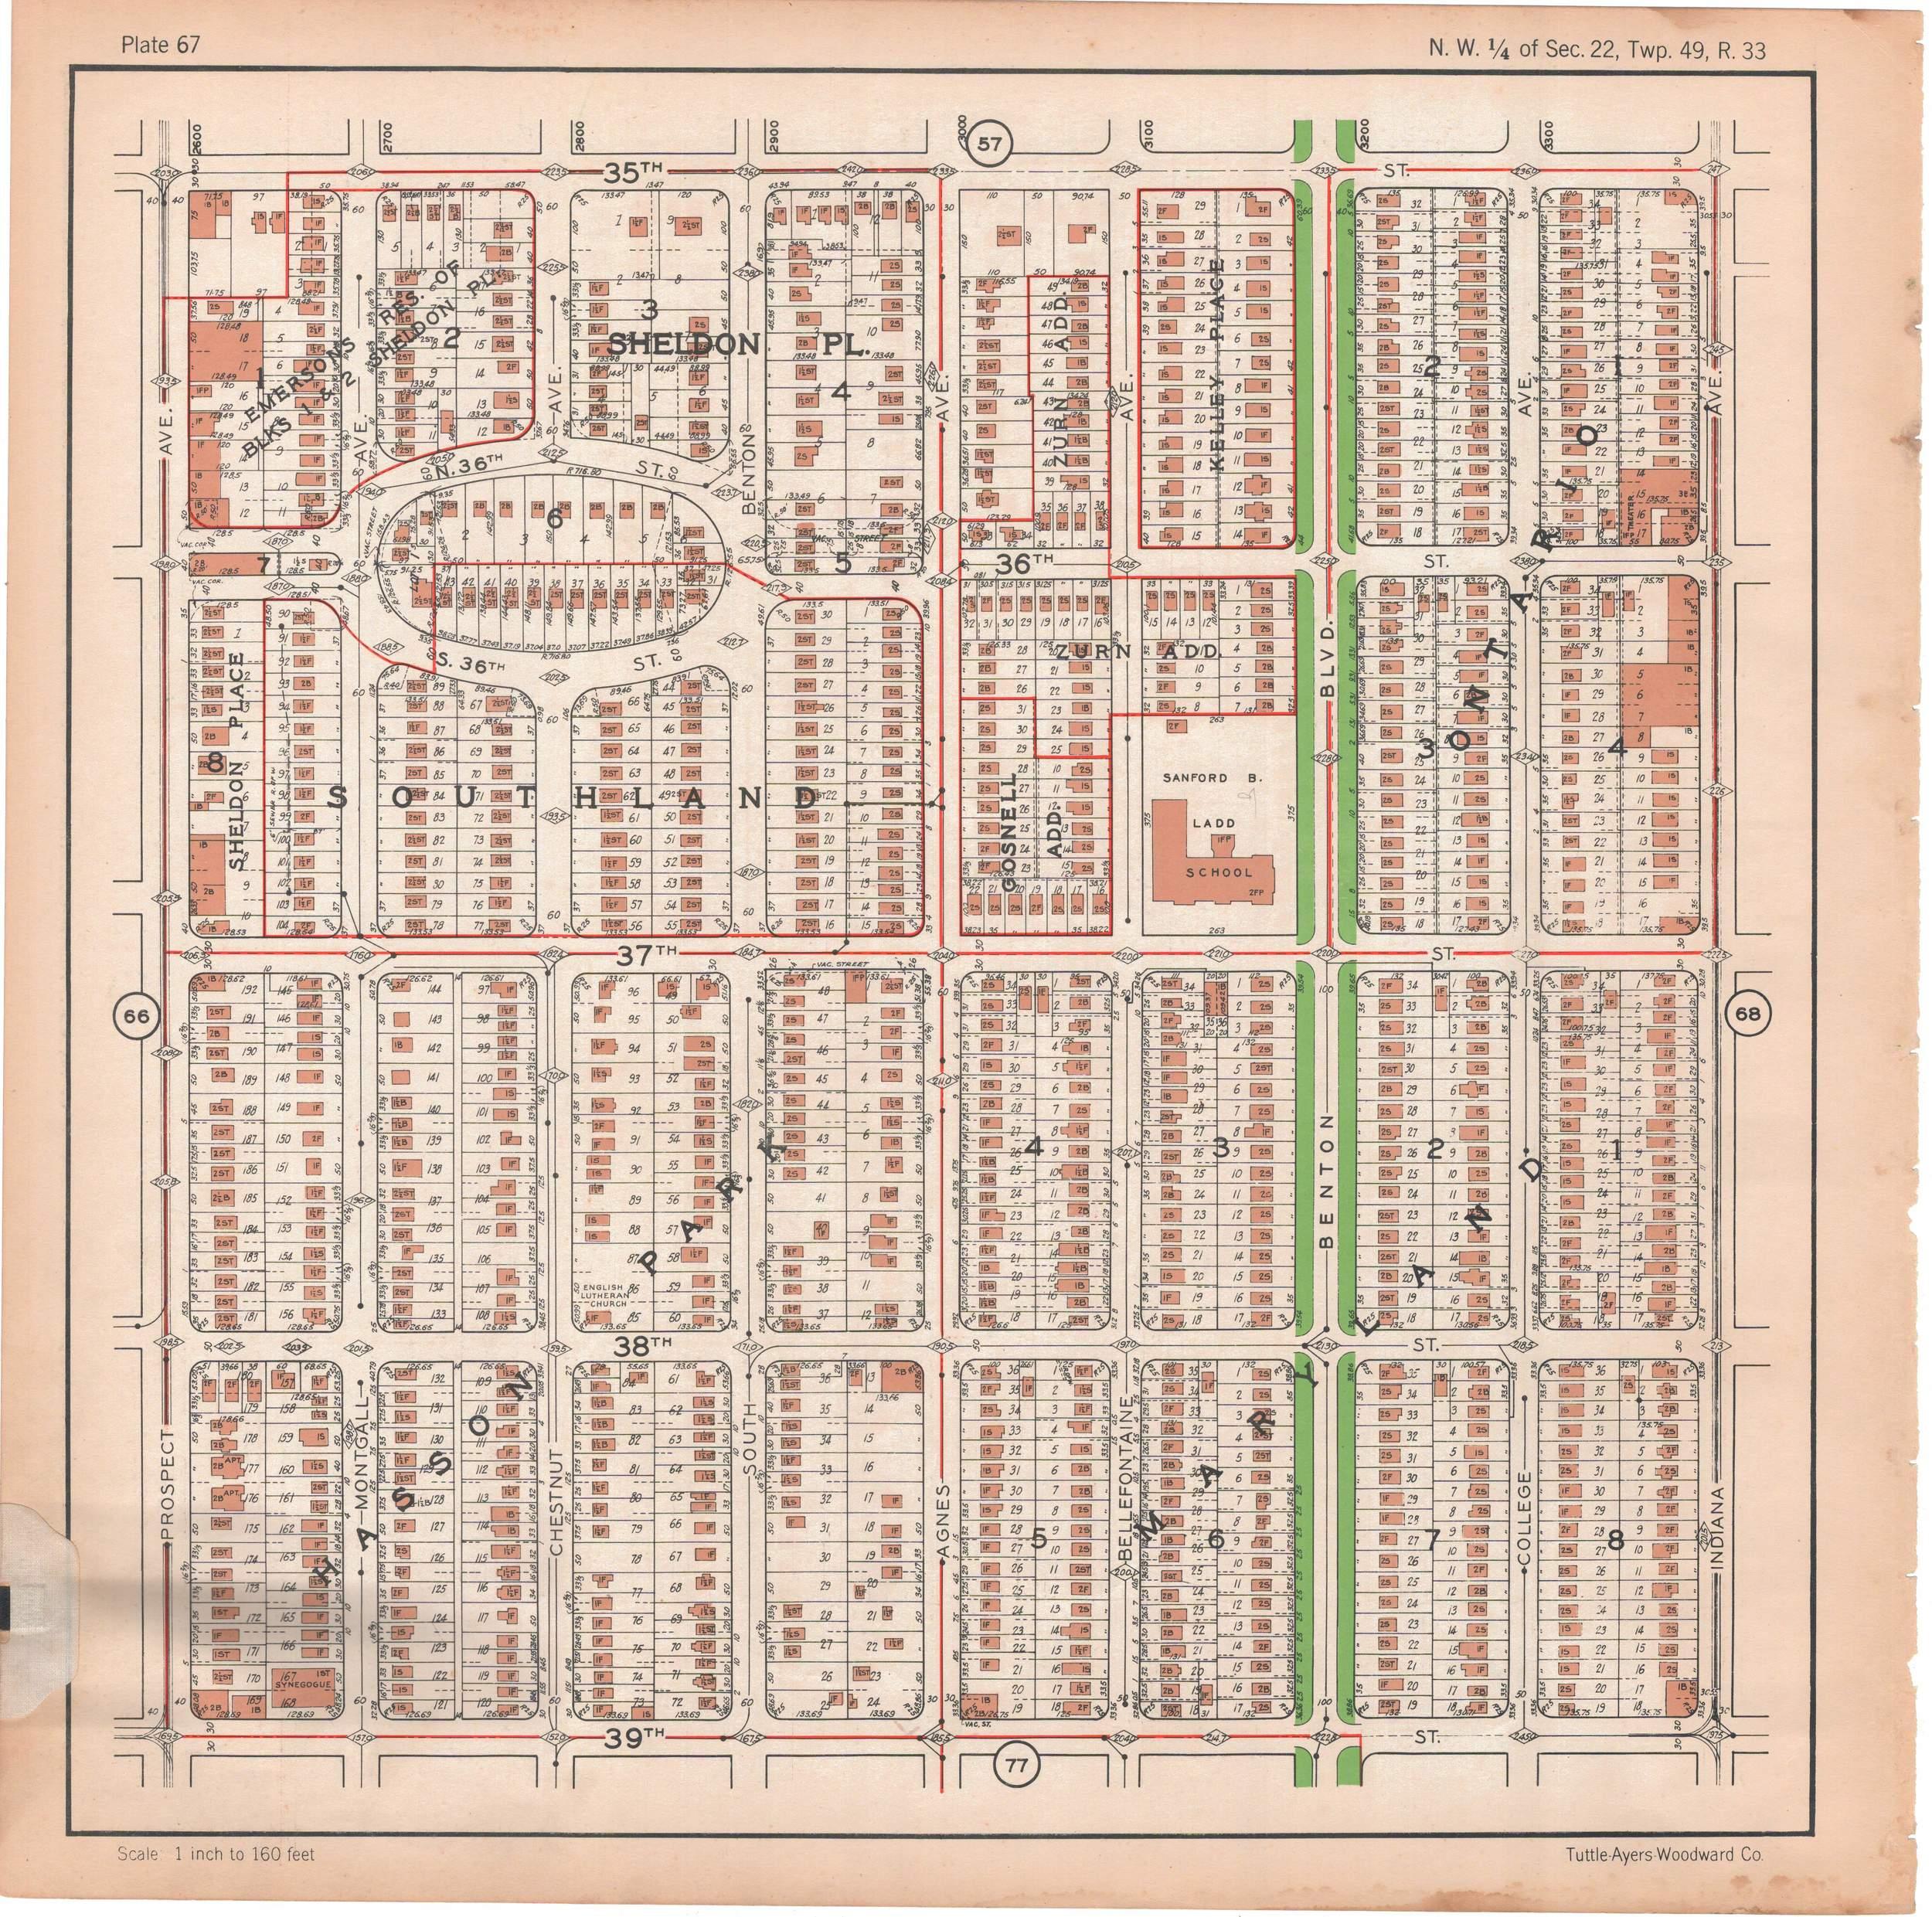 1925 TUTTLE_AYERS_Plate 67.JPG